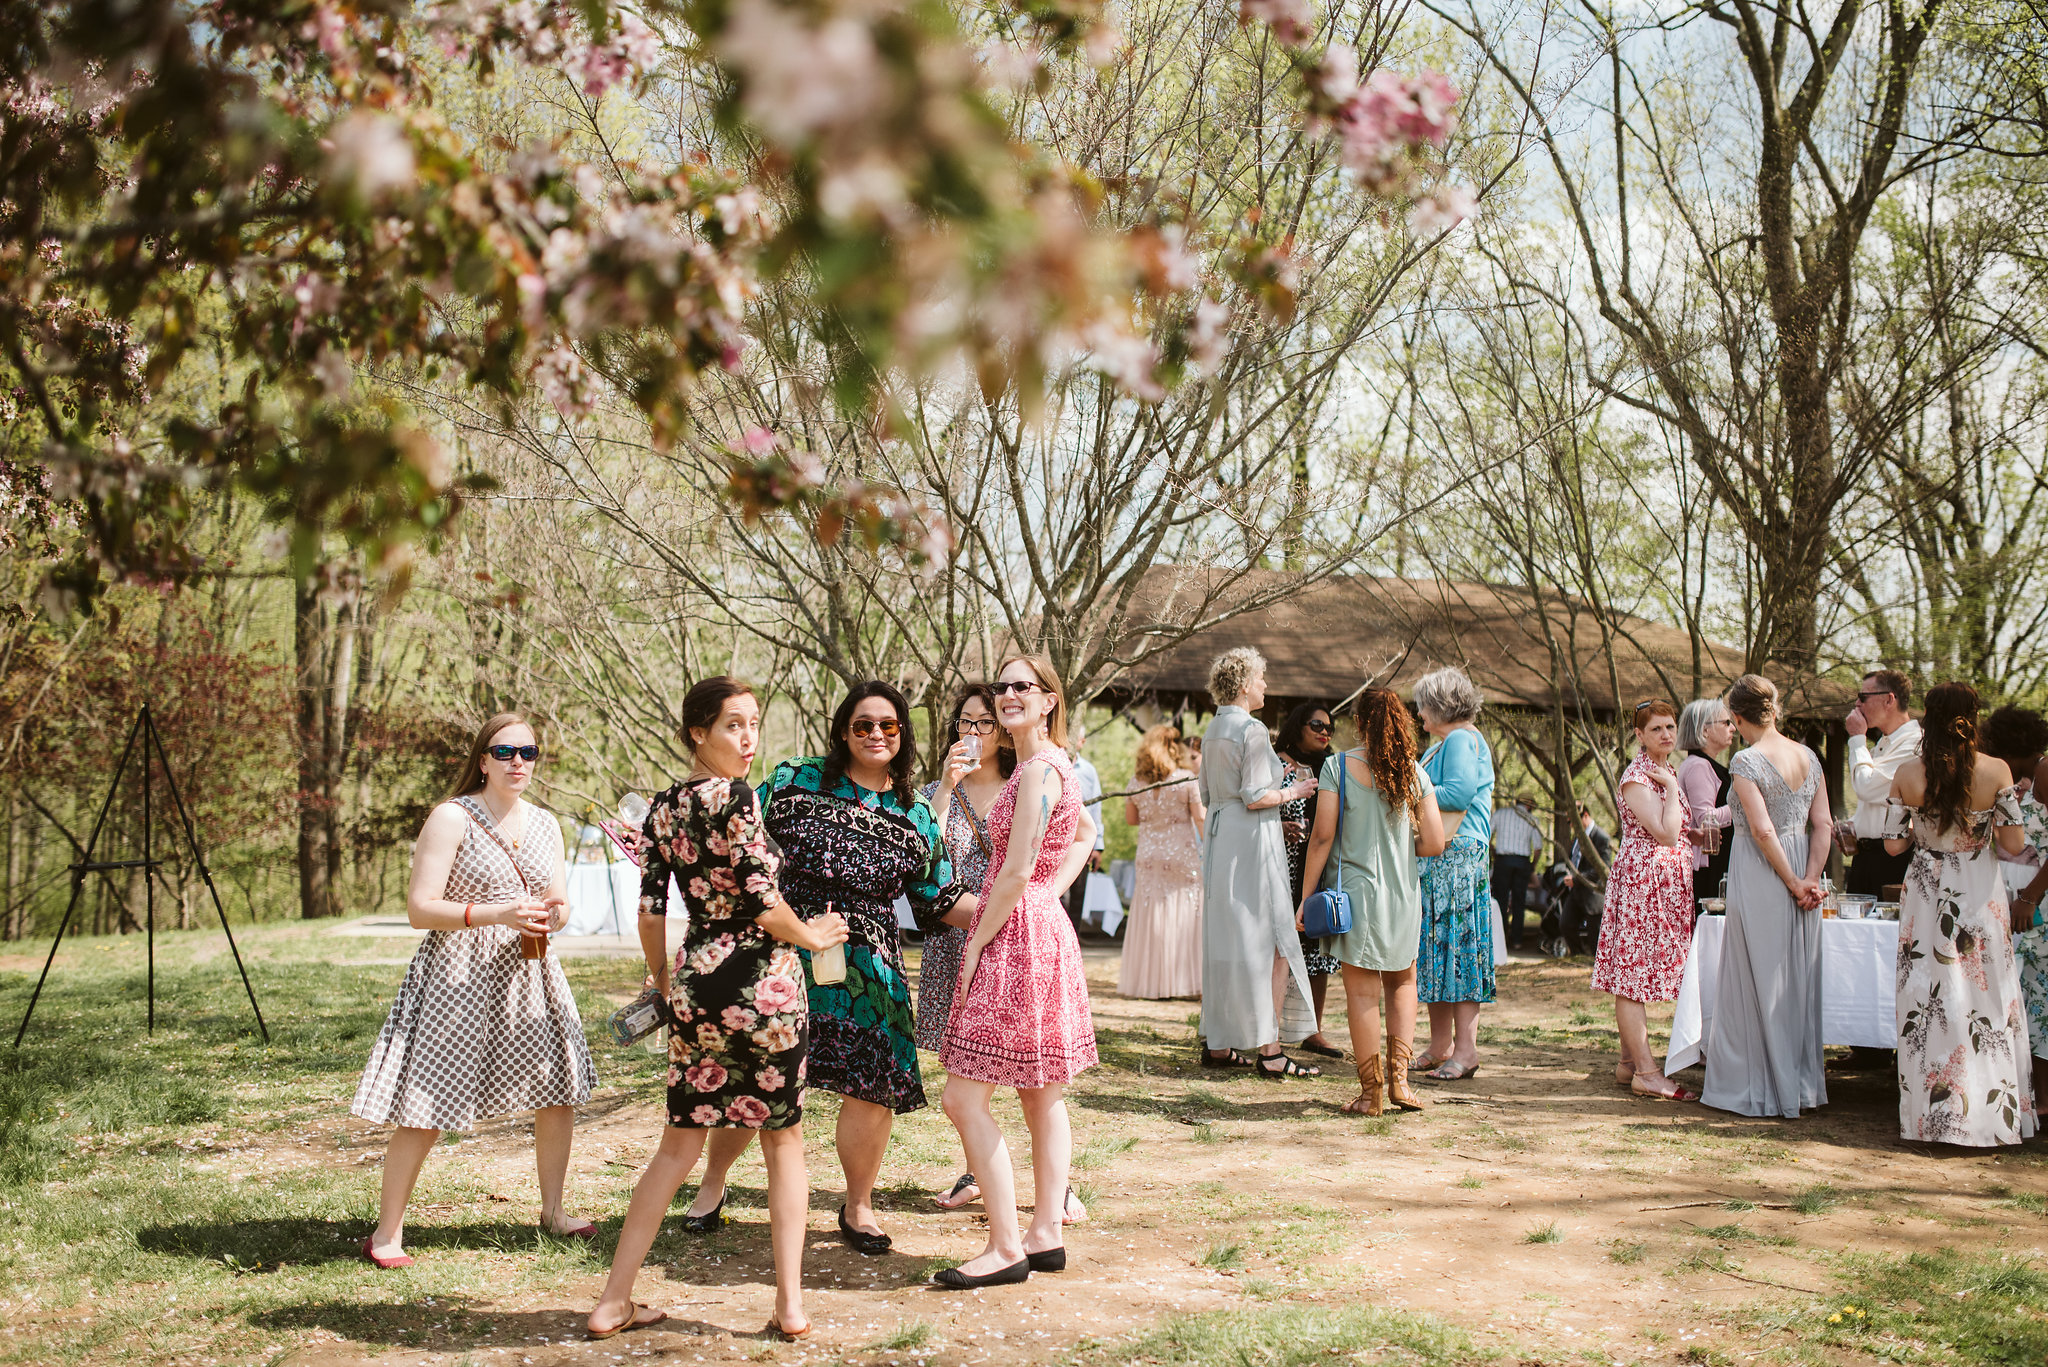 Spring Outdoor Wedding, Park, Baltimore Wedding Photographer, DIY, Classic, Upcycled, Garden Party, Romantic, Friends Having Fun at Reception